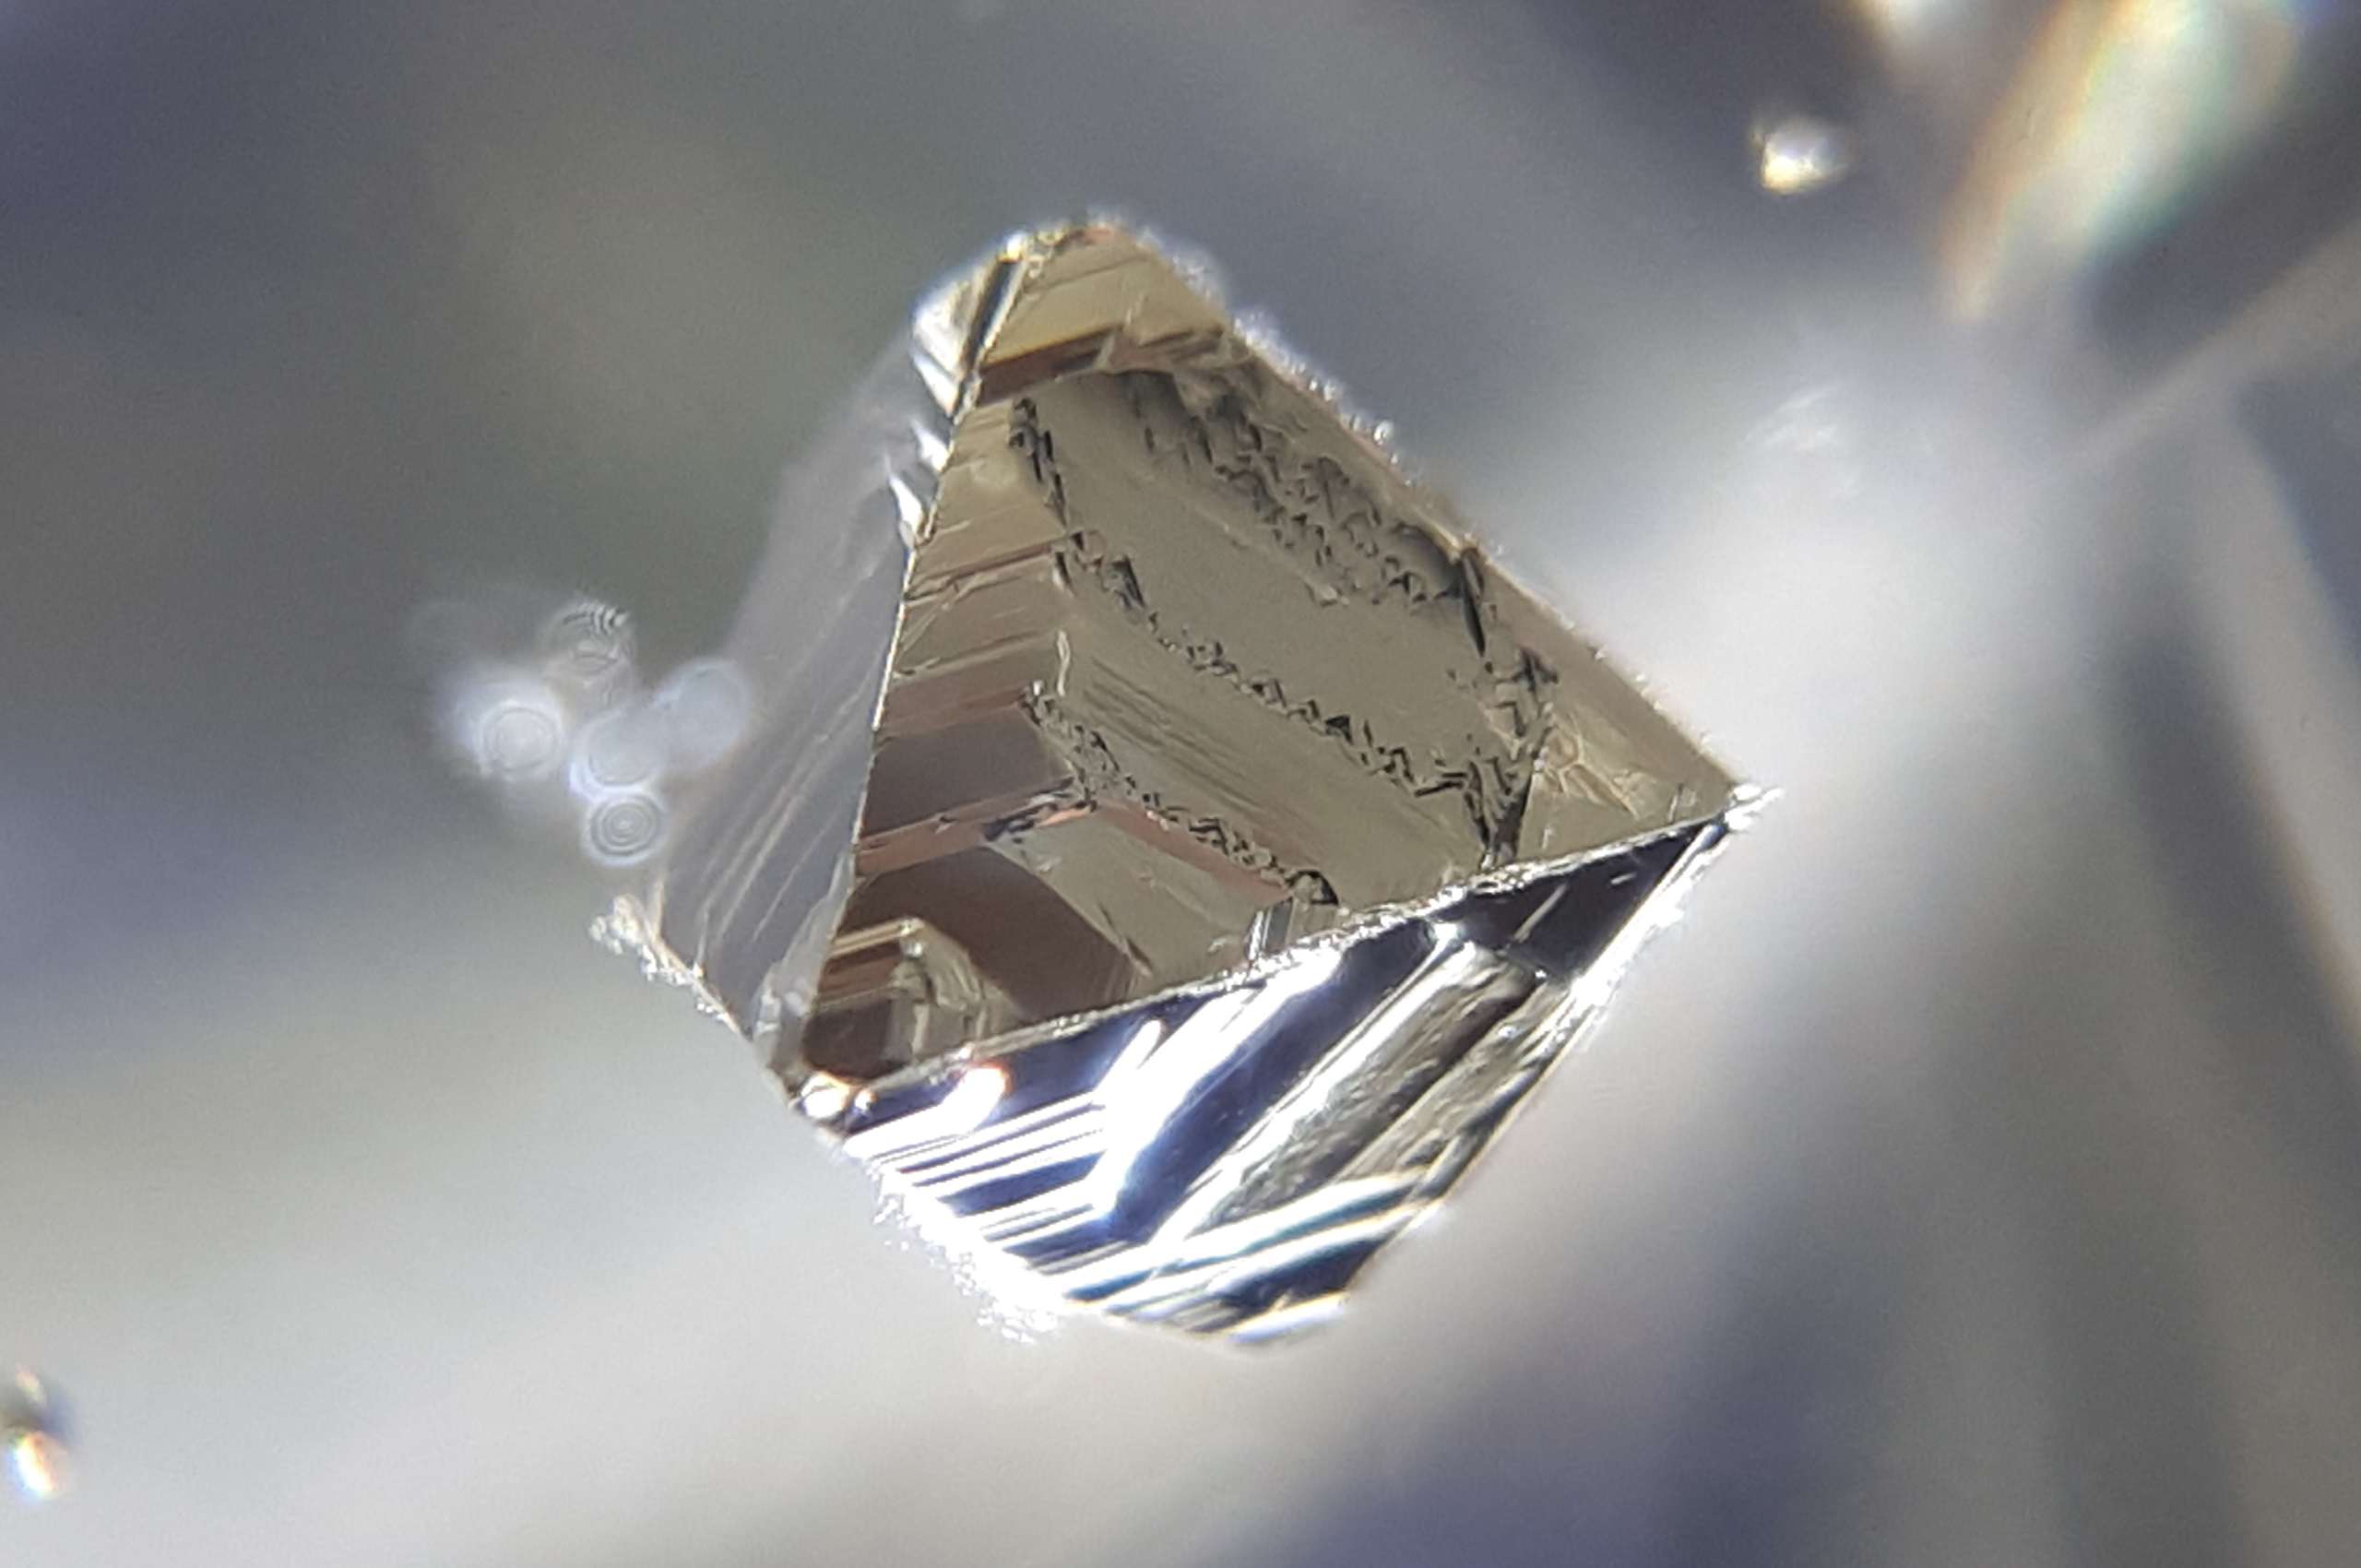 Pyrite inclusions in Quartz - Russia, Astafiewskoe deposit, South Ural (1) - Igor Bolotovski